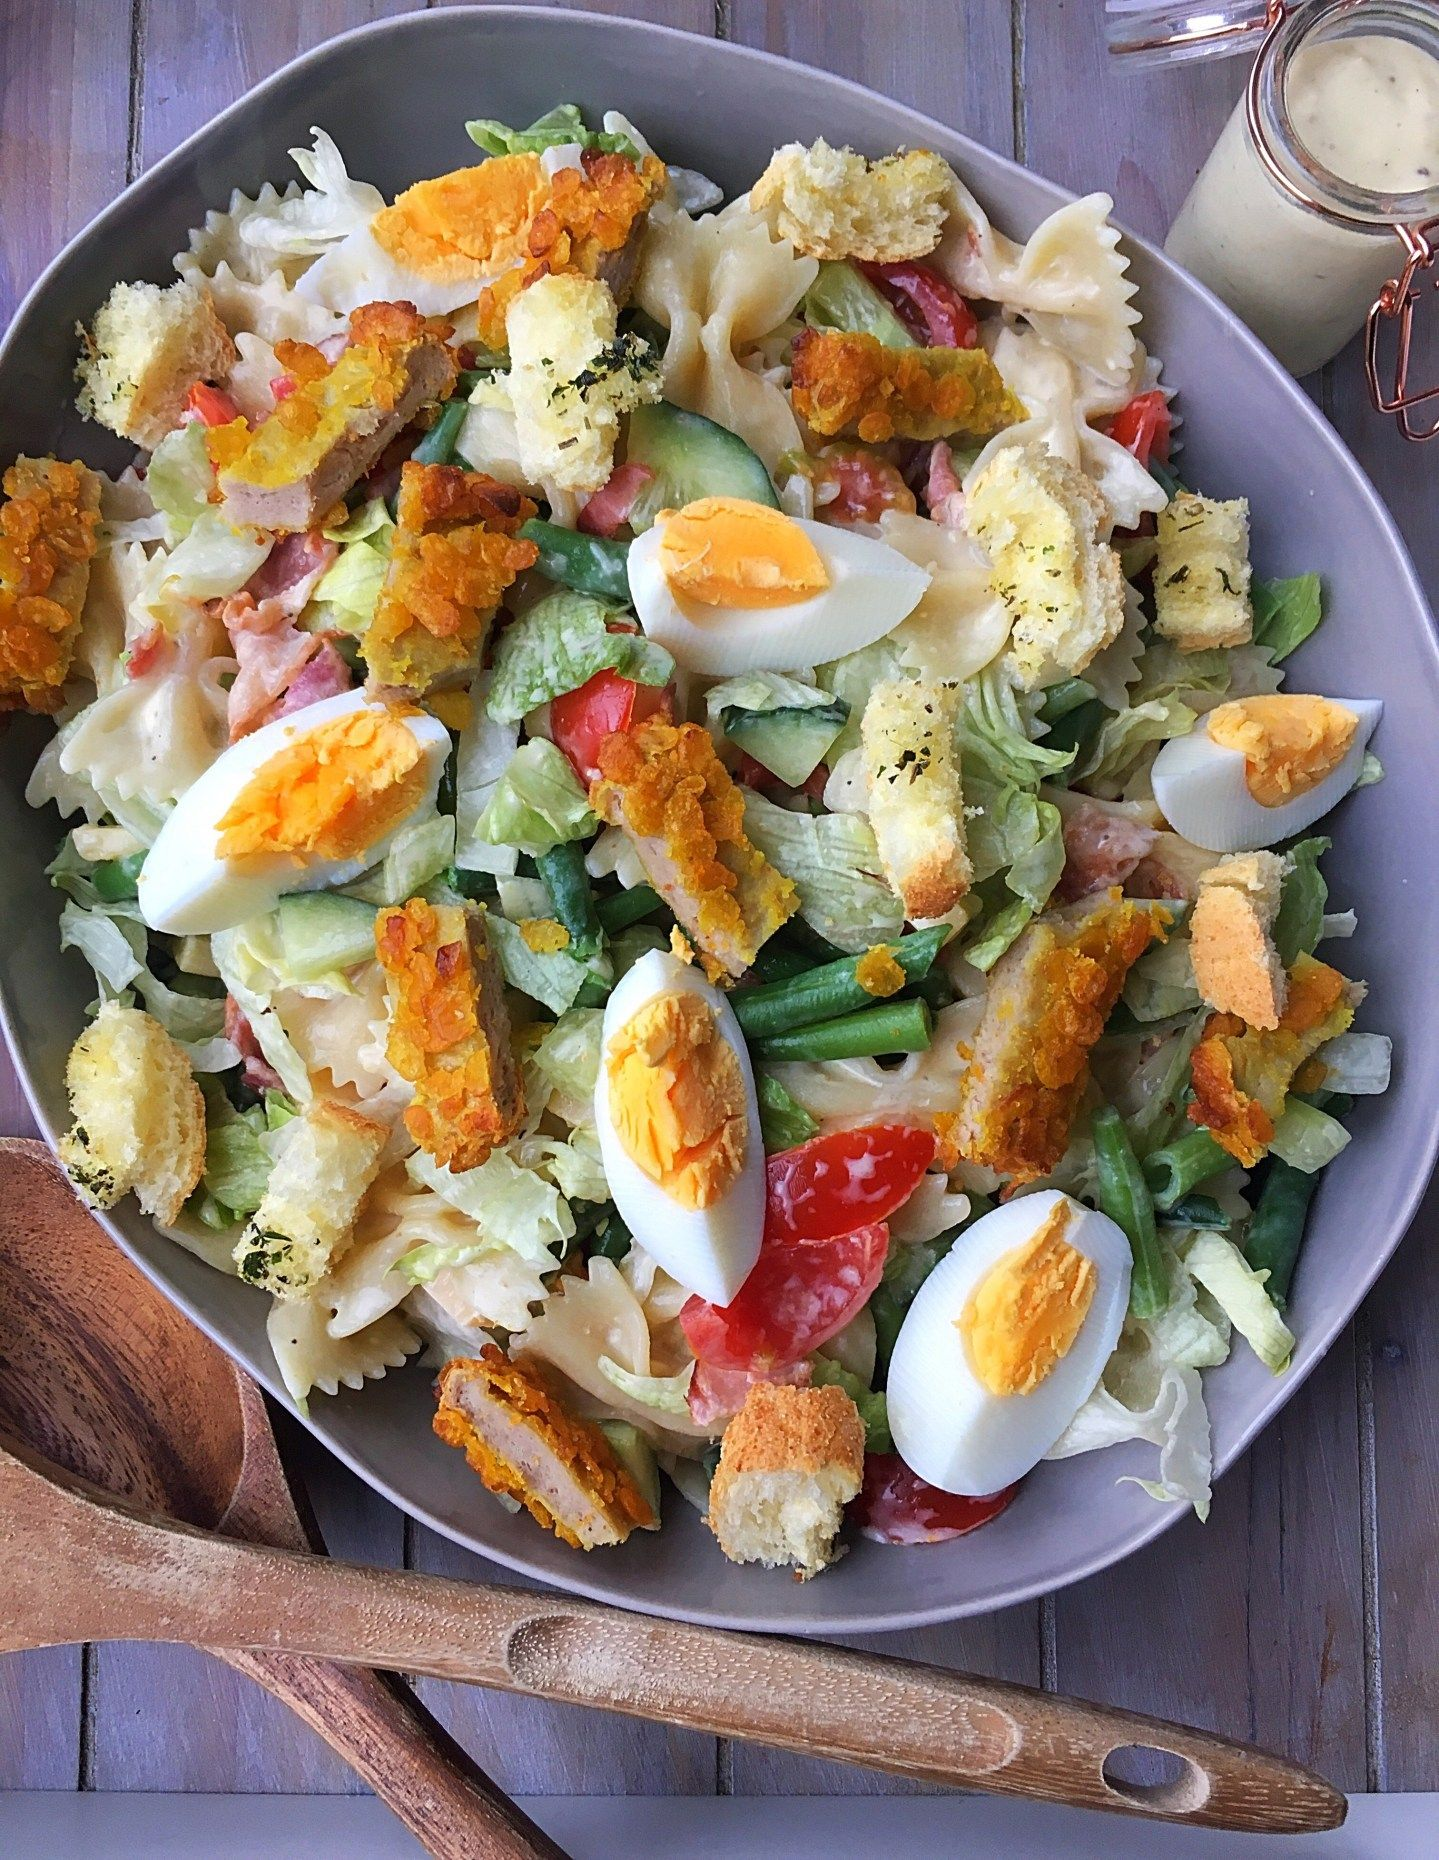 Caesar salade - Tasty Food SoMe #gezondeten